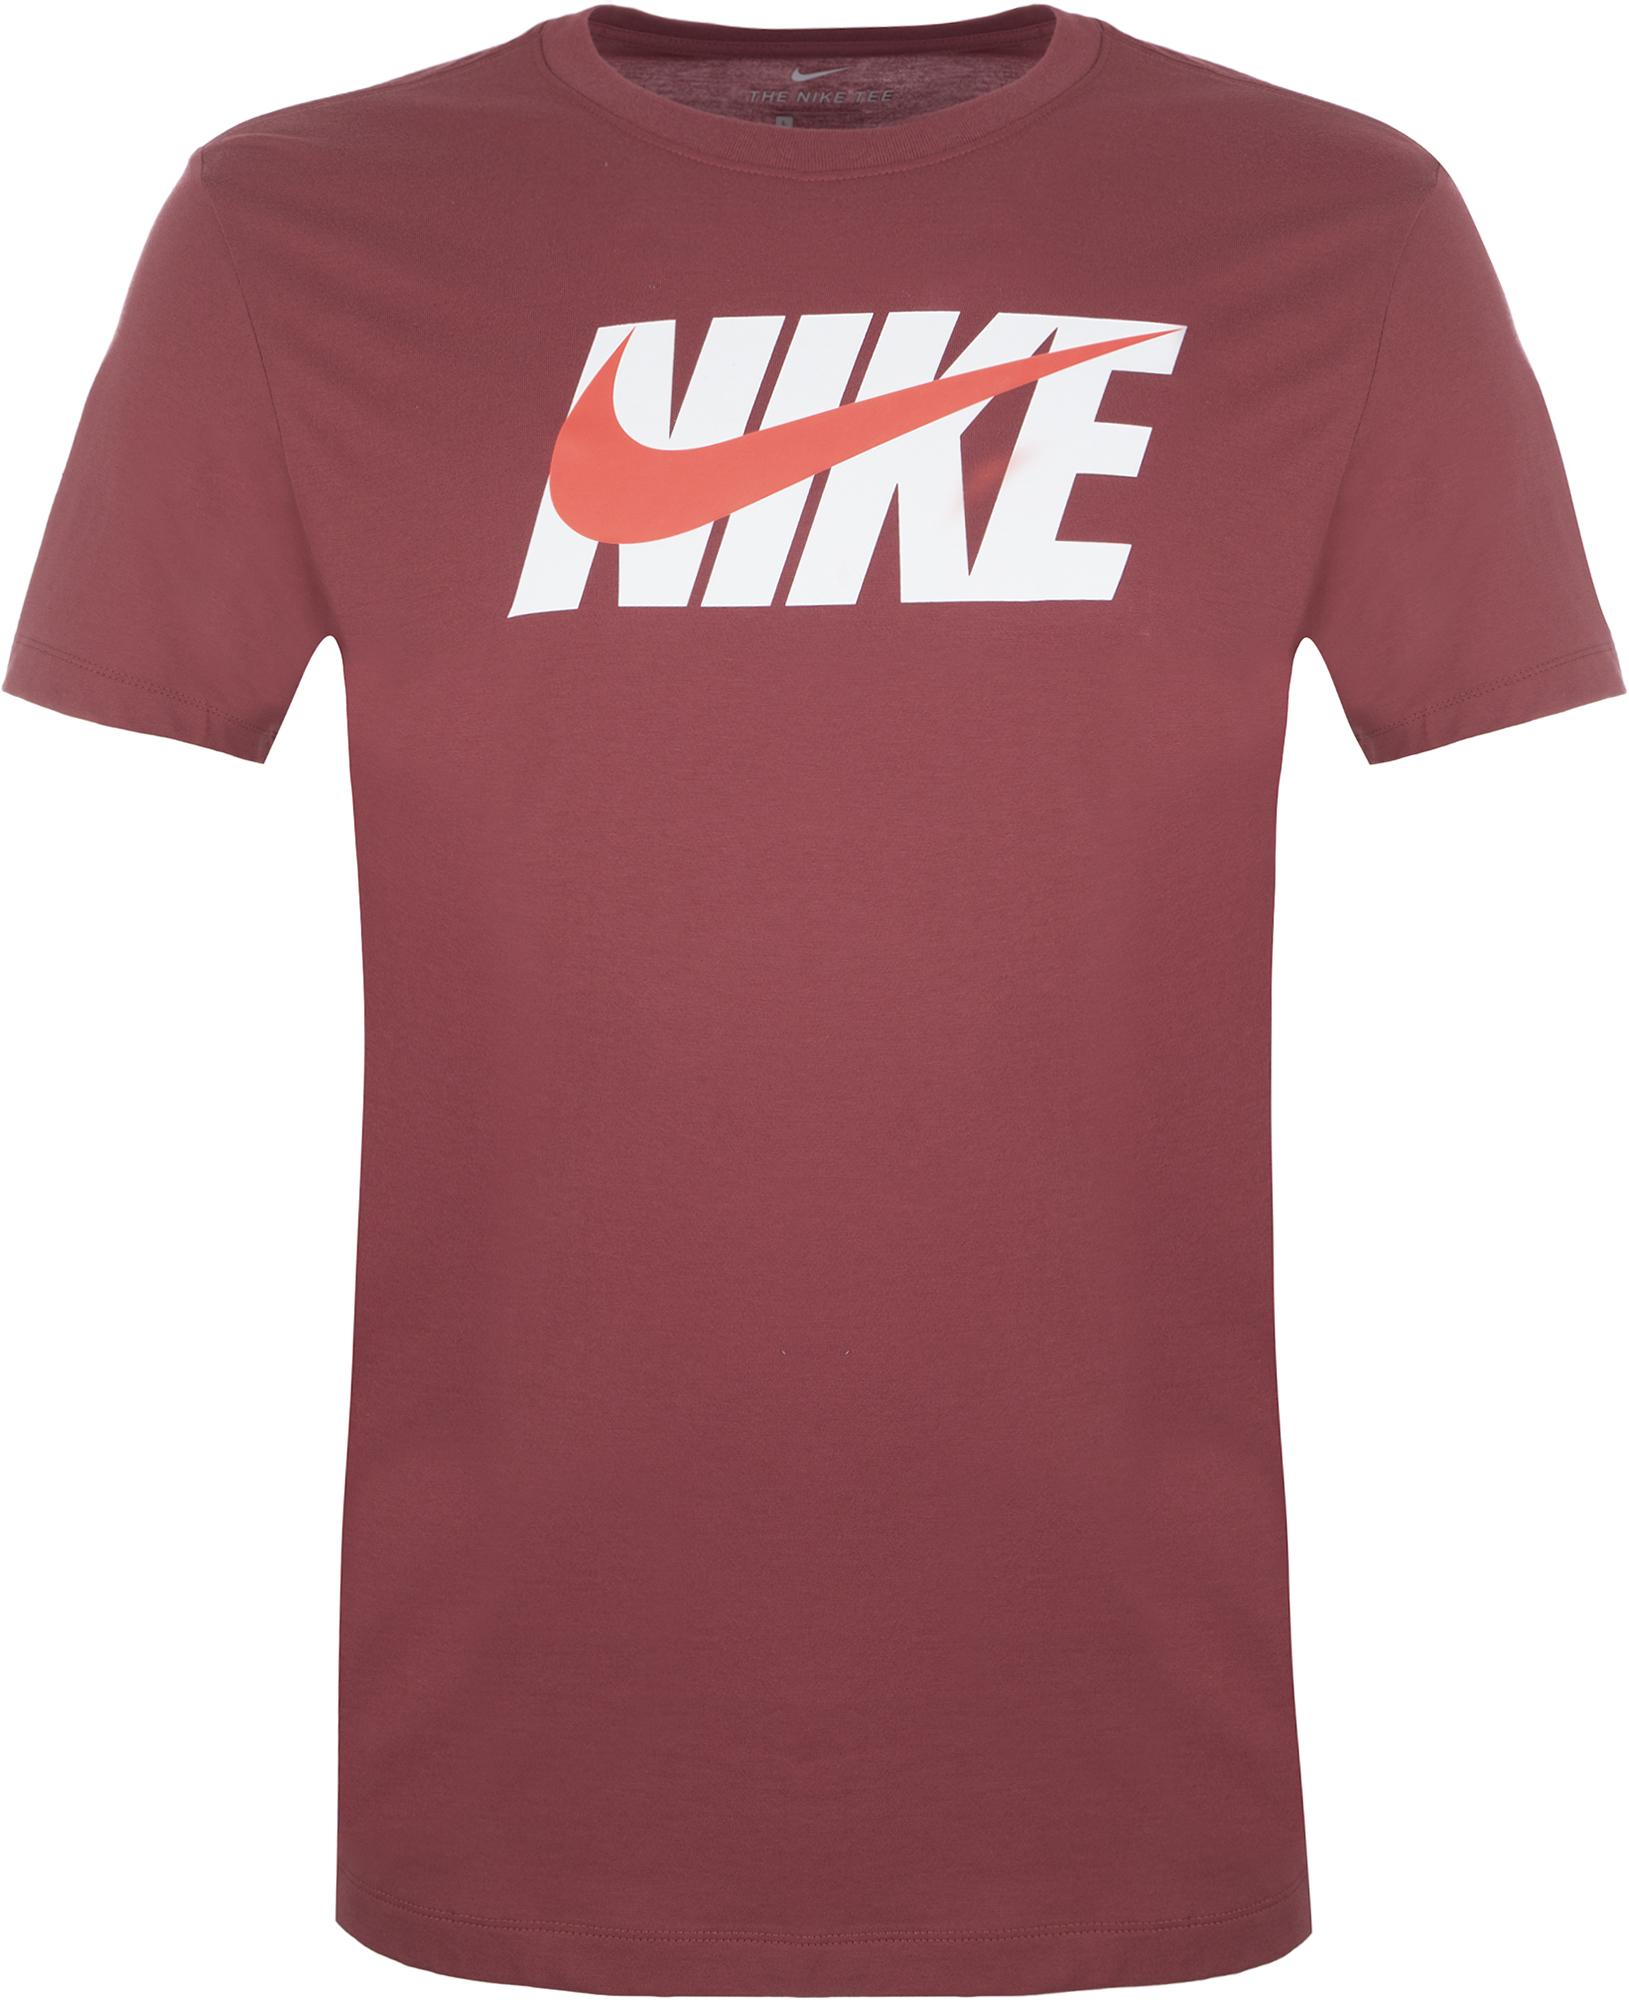 Nike Футболка мужская Nike, размер 50-52 nike футболка мужская nike cool miler